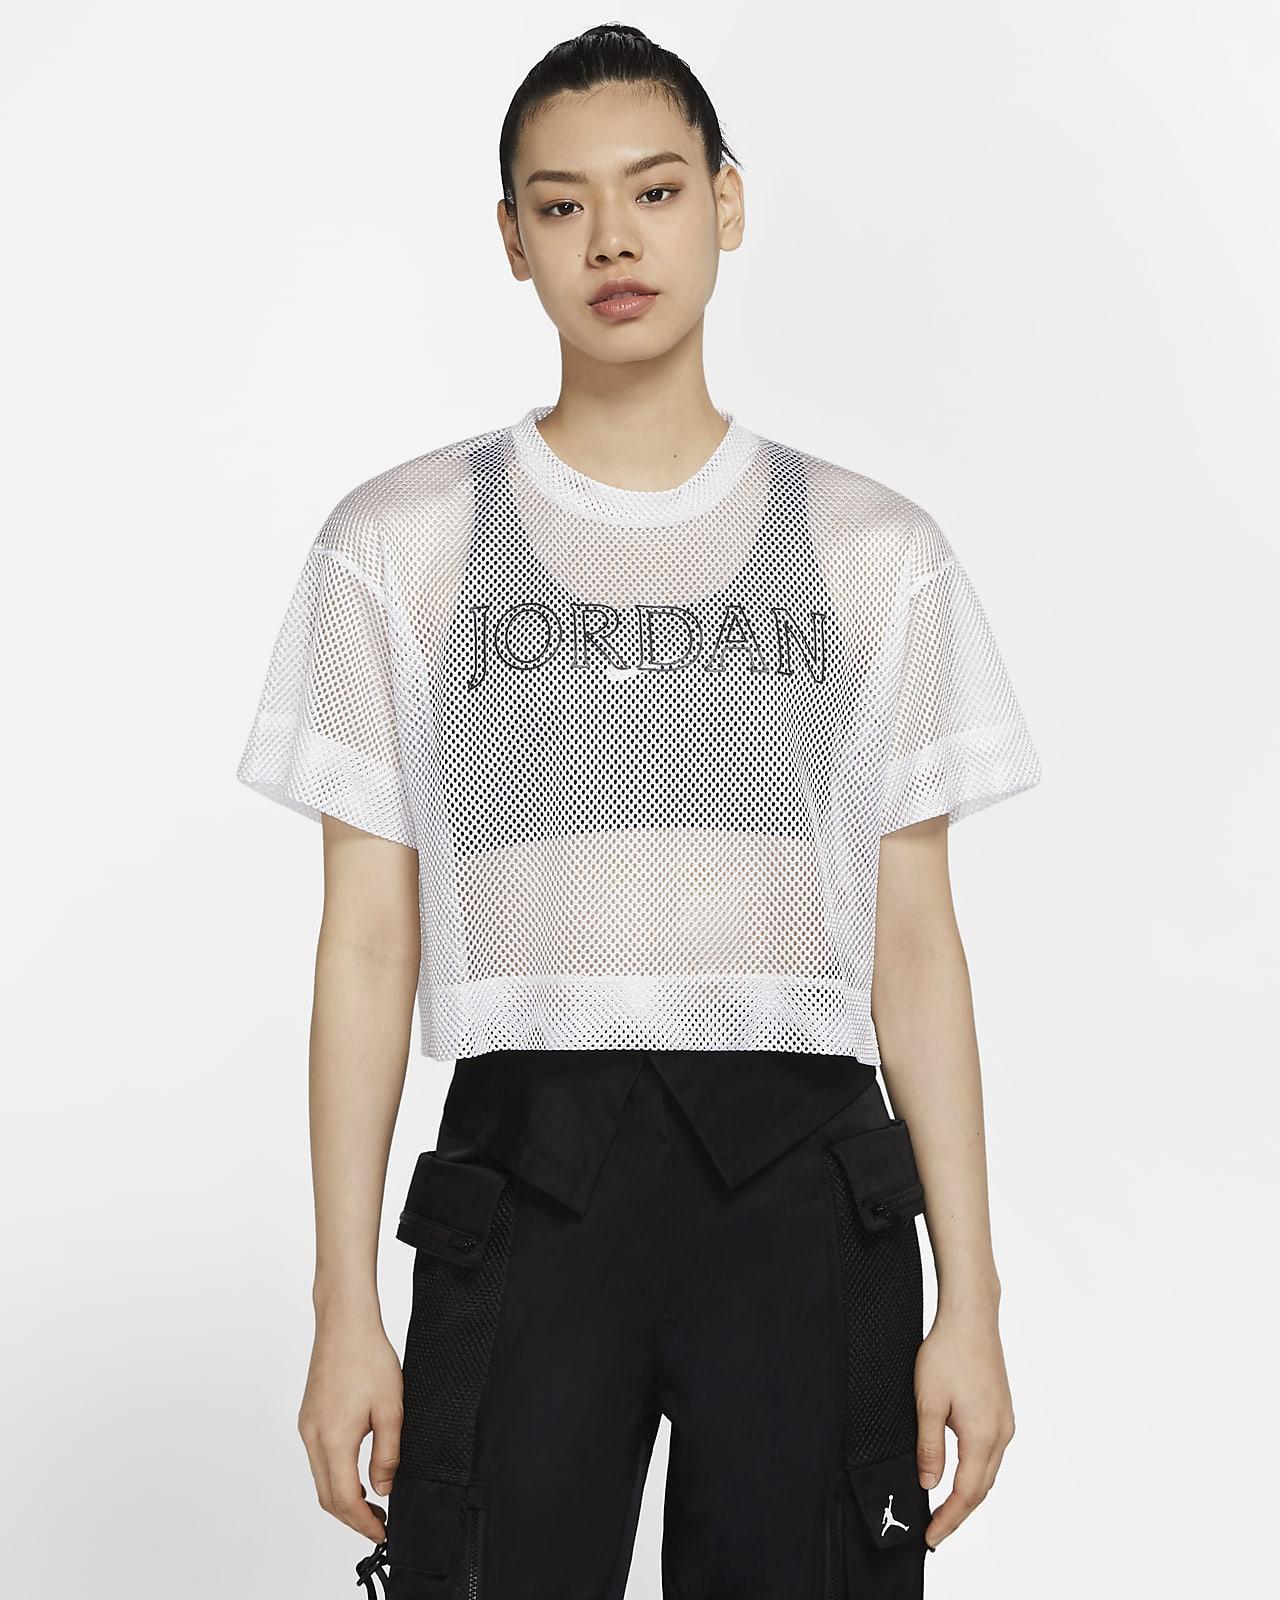 Jordan Utility 女子短袖网眼布上衣